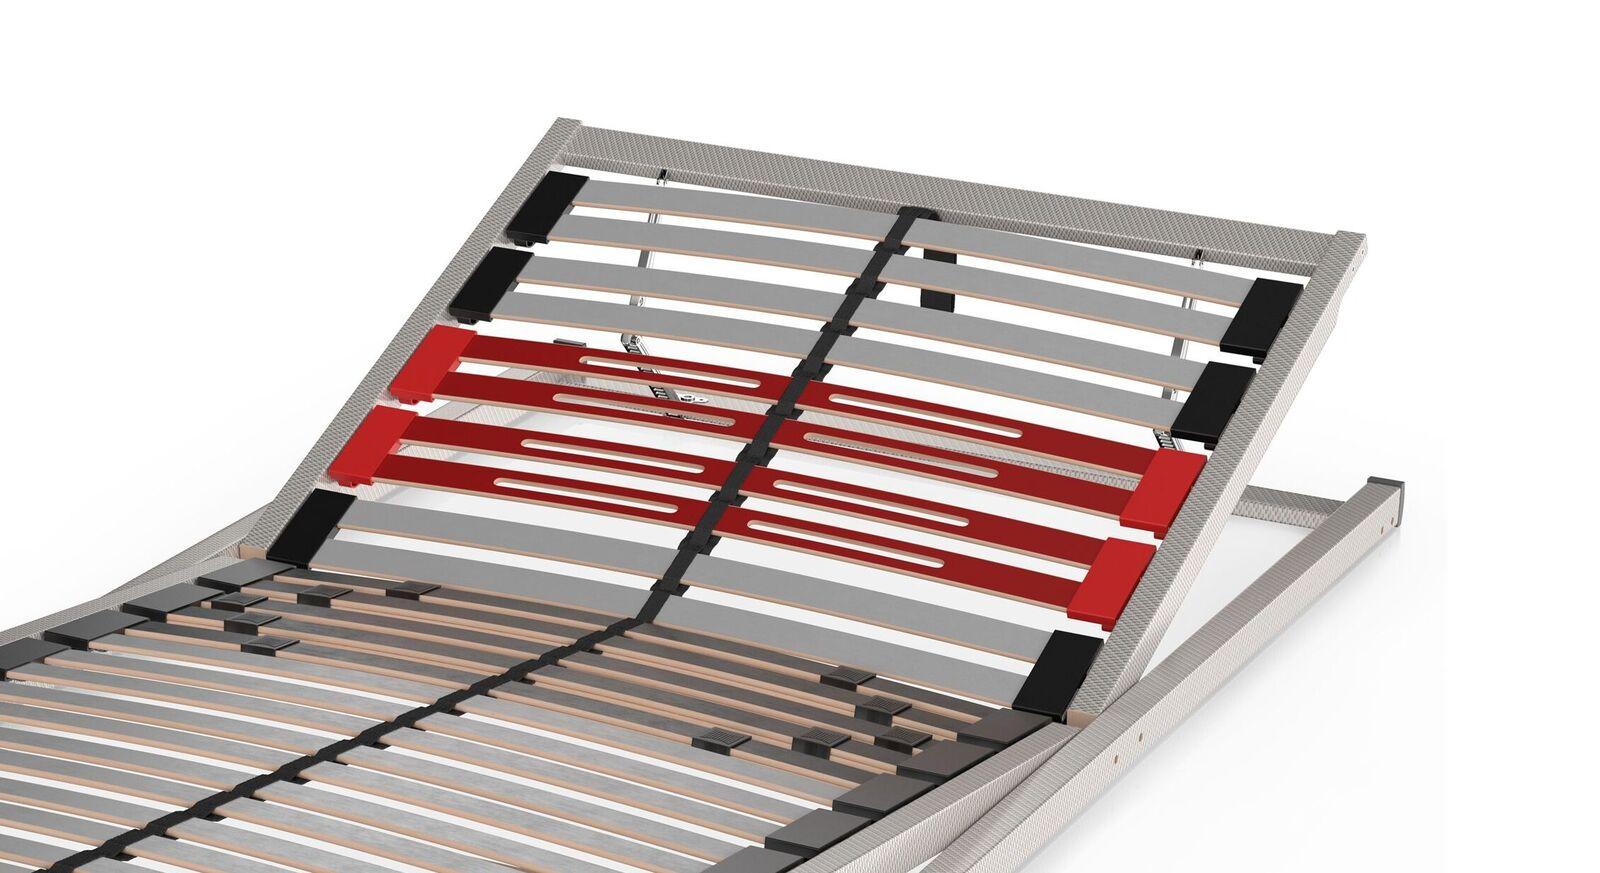 SCHLARAFFIA Lattenrost Classic 28 NV/KF mit flexibler Schulterabsenkung